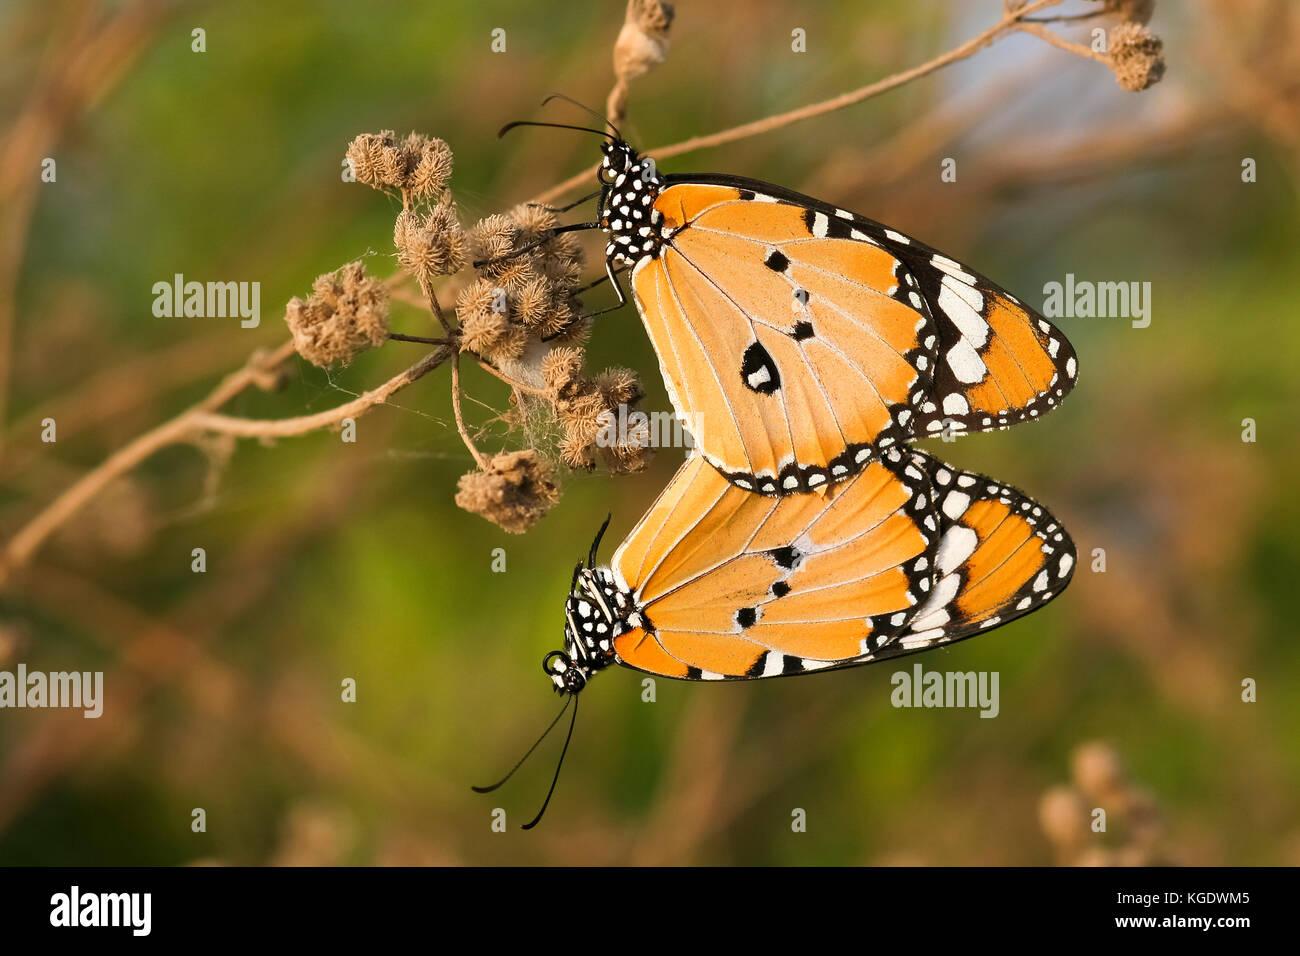 Plain Tiger (danaus chrysippus) aka afrikanischer monarch butterfly Schuß in Israel, Sommer August Stockbild